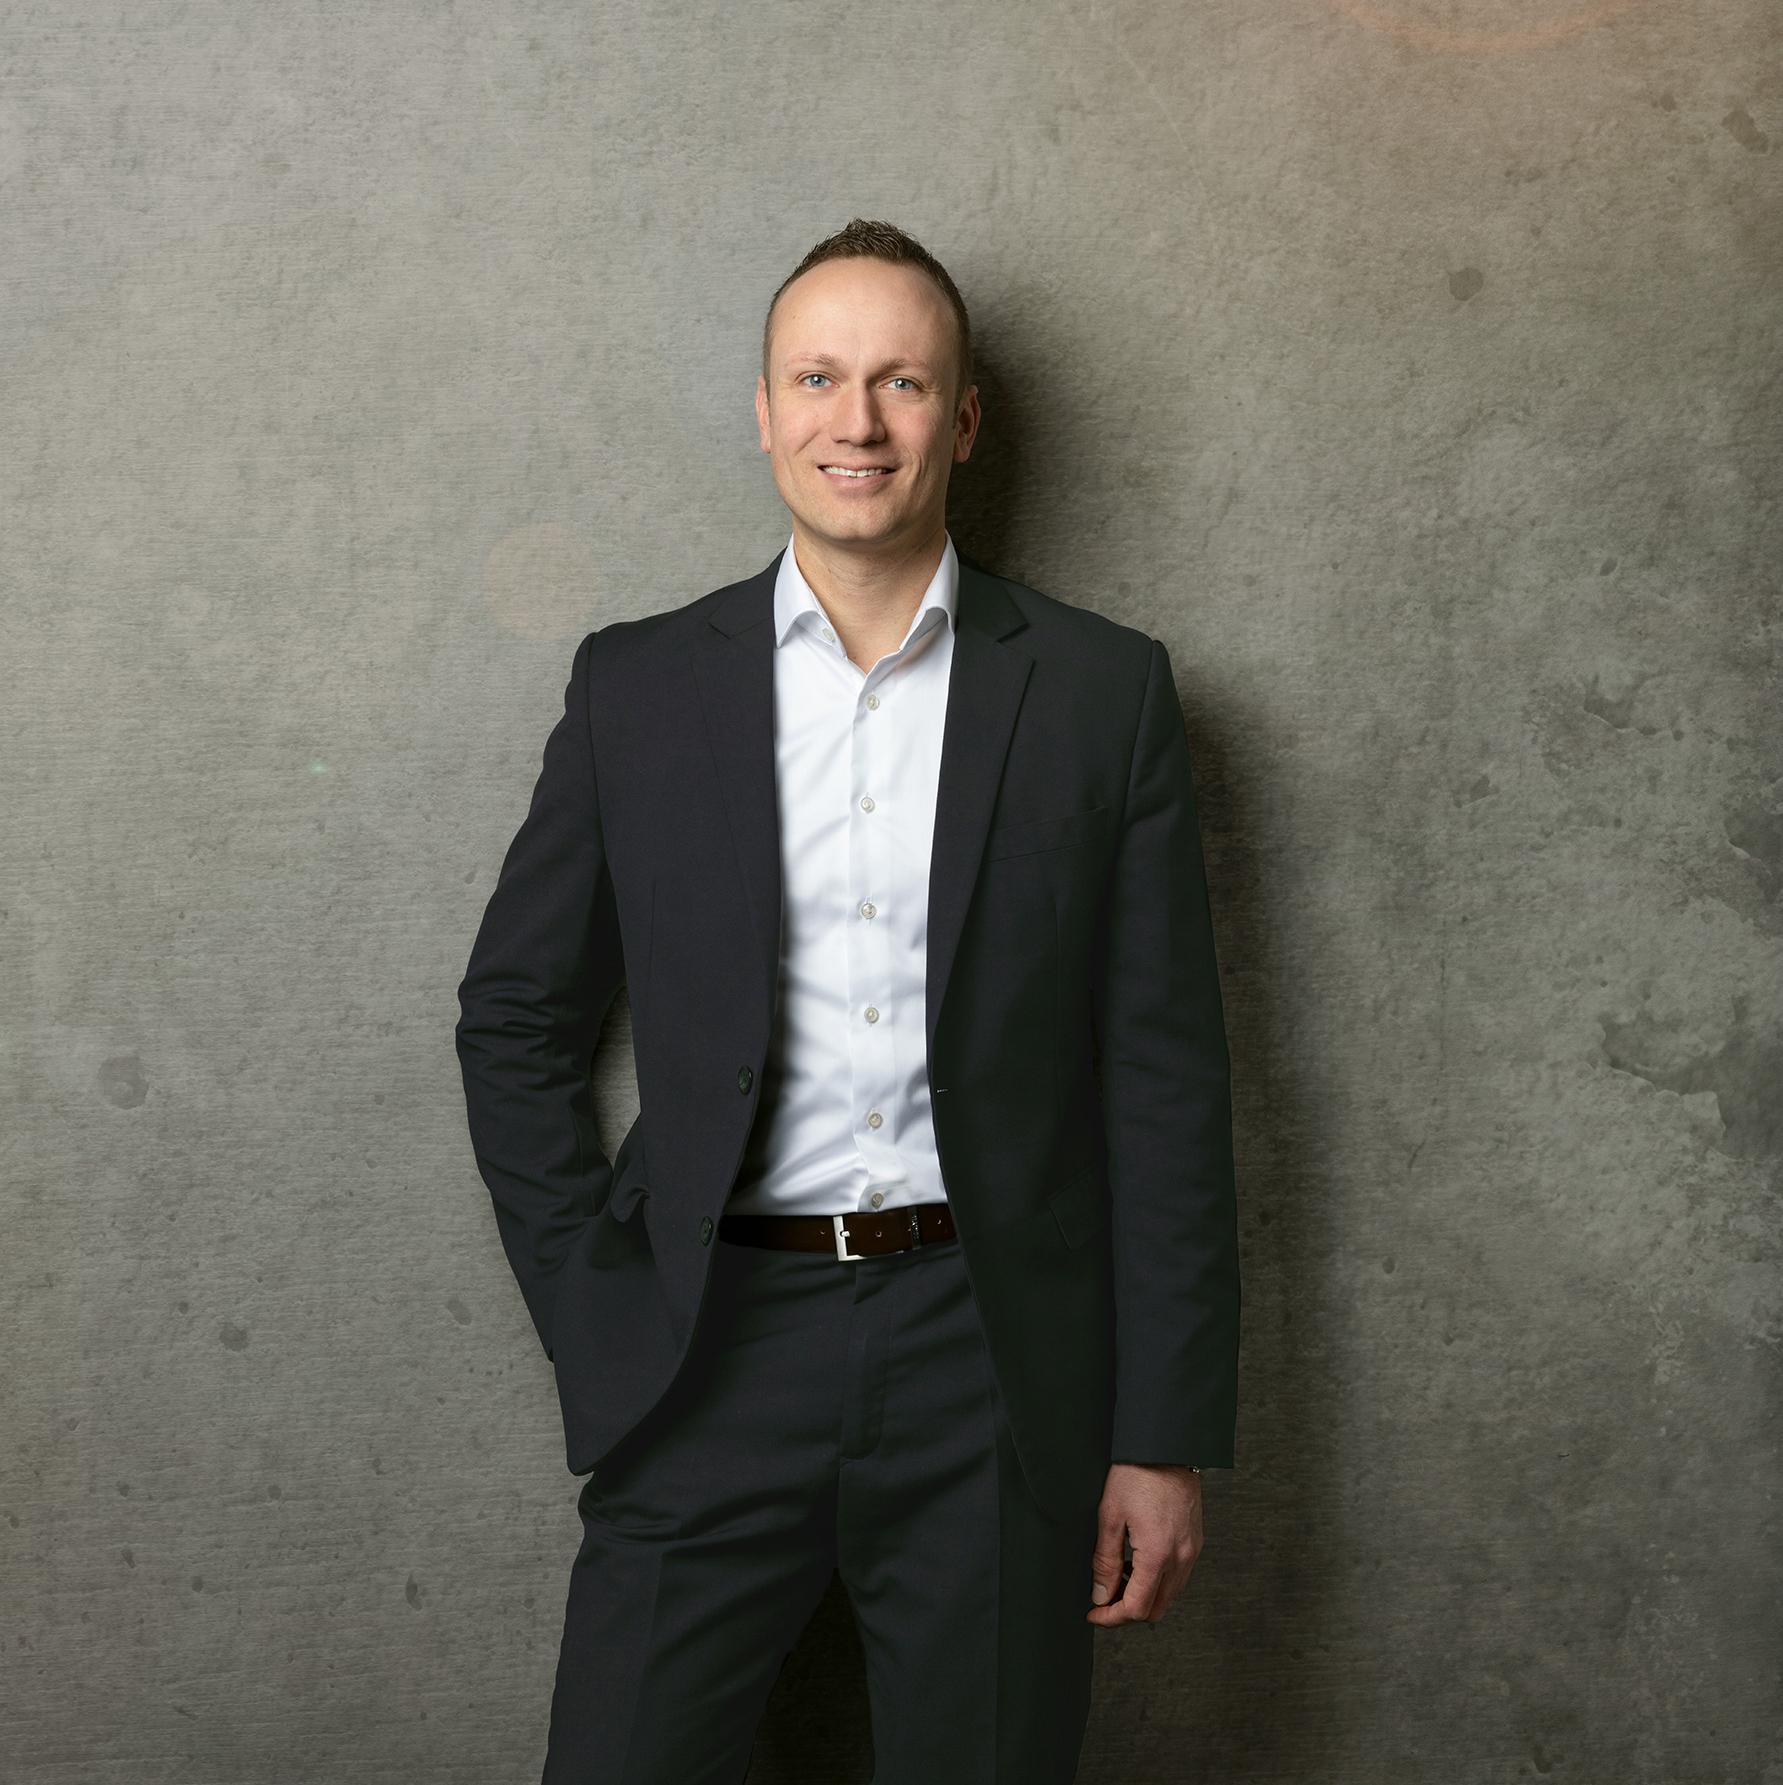 Andreas Häberle